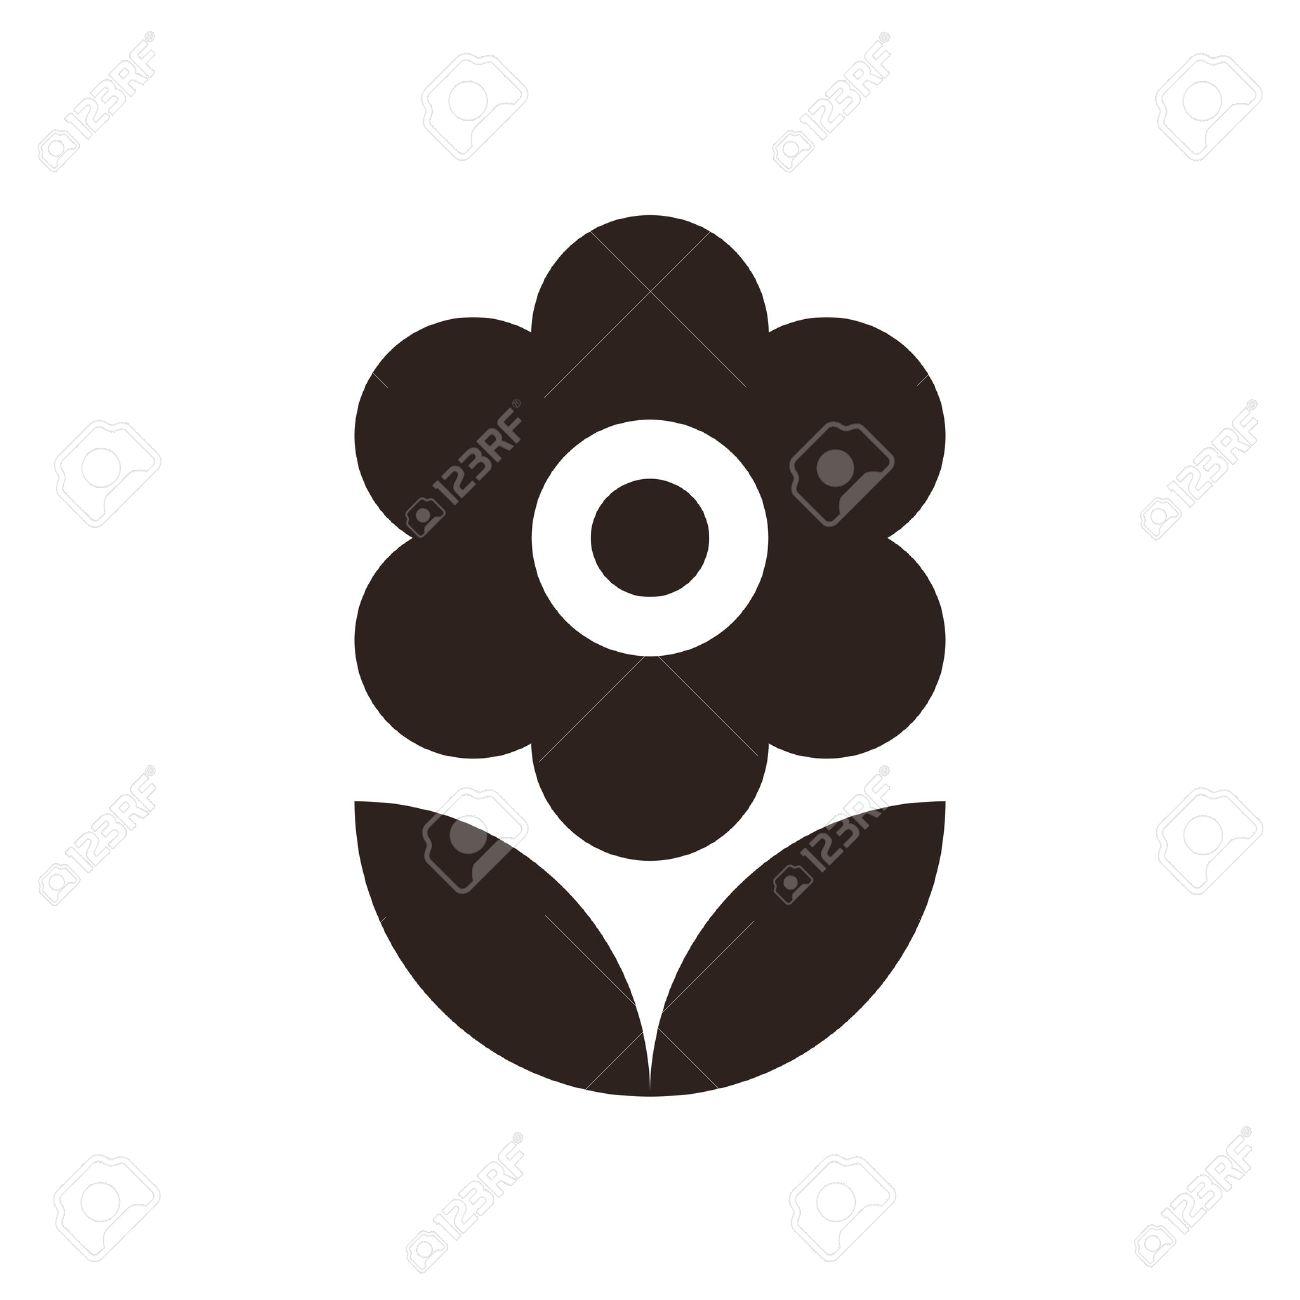 Flower icon isolated on white background - 40818633